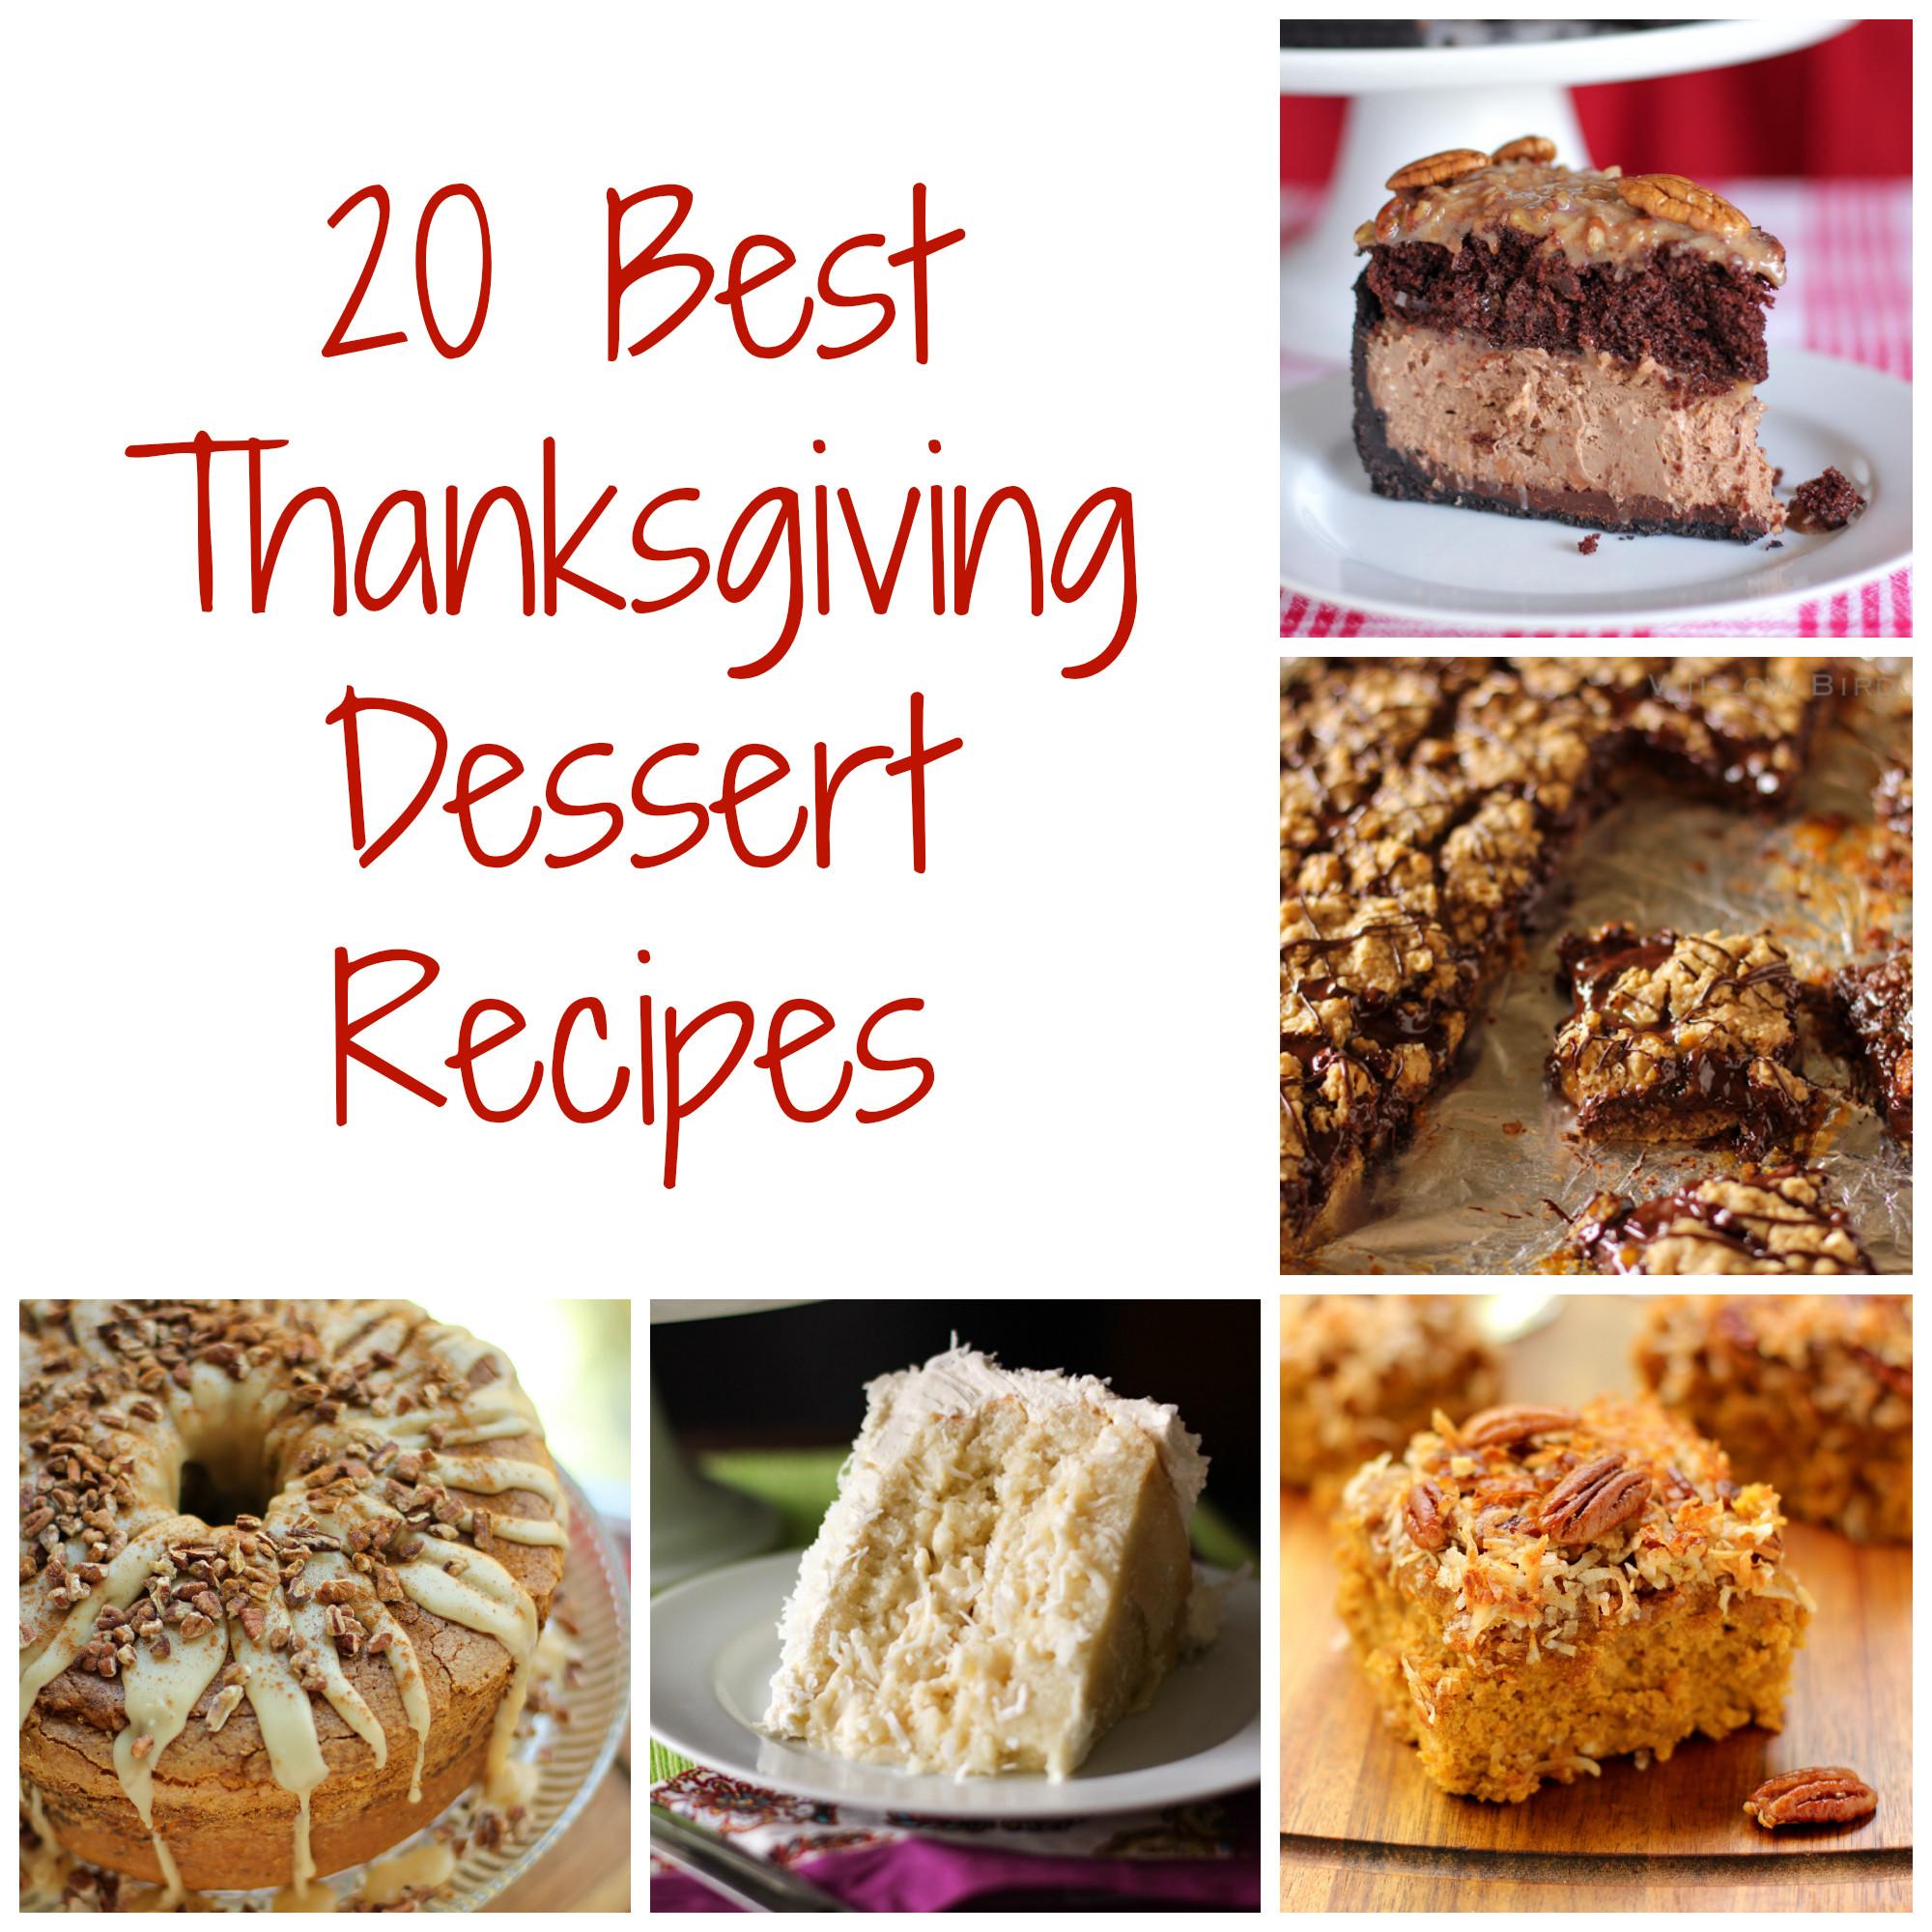 Best Thanksgiving Pies Recipes  Thanksgiving Dessert Recipes Willow Bird Baking